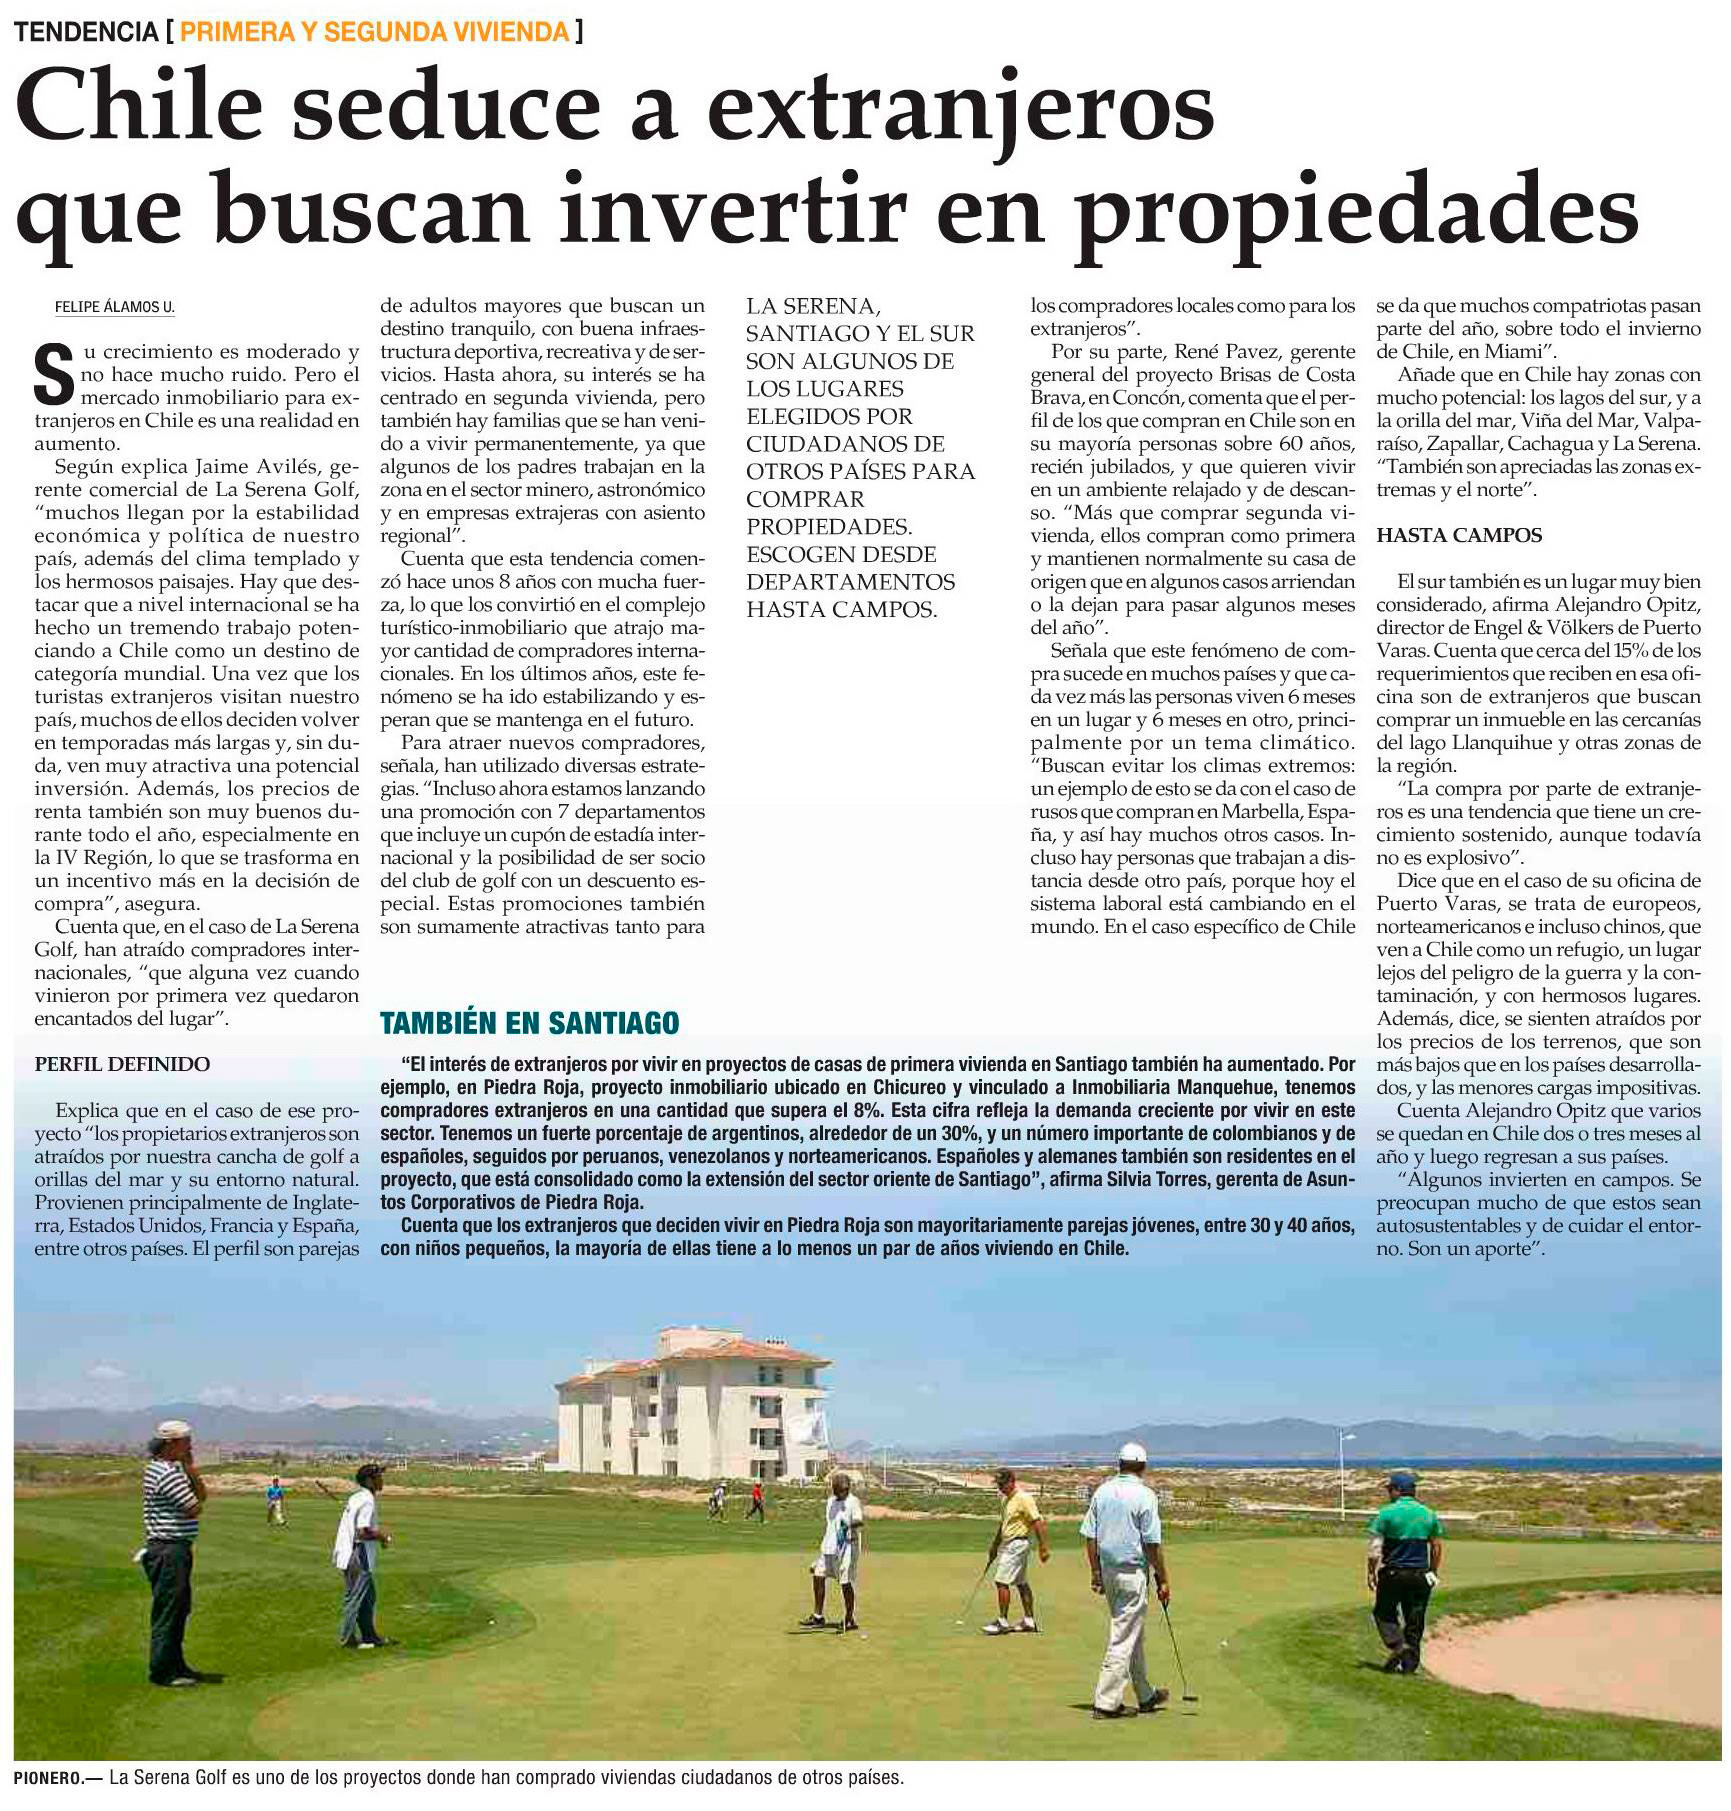 Extranjeros Piedra Roja, El Mercurio